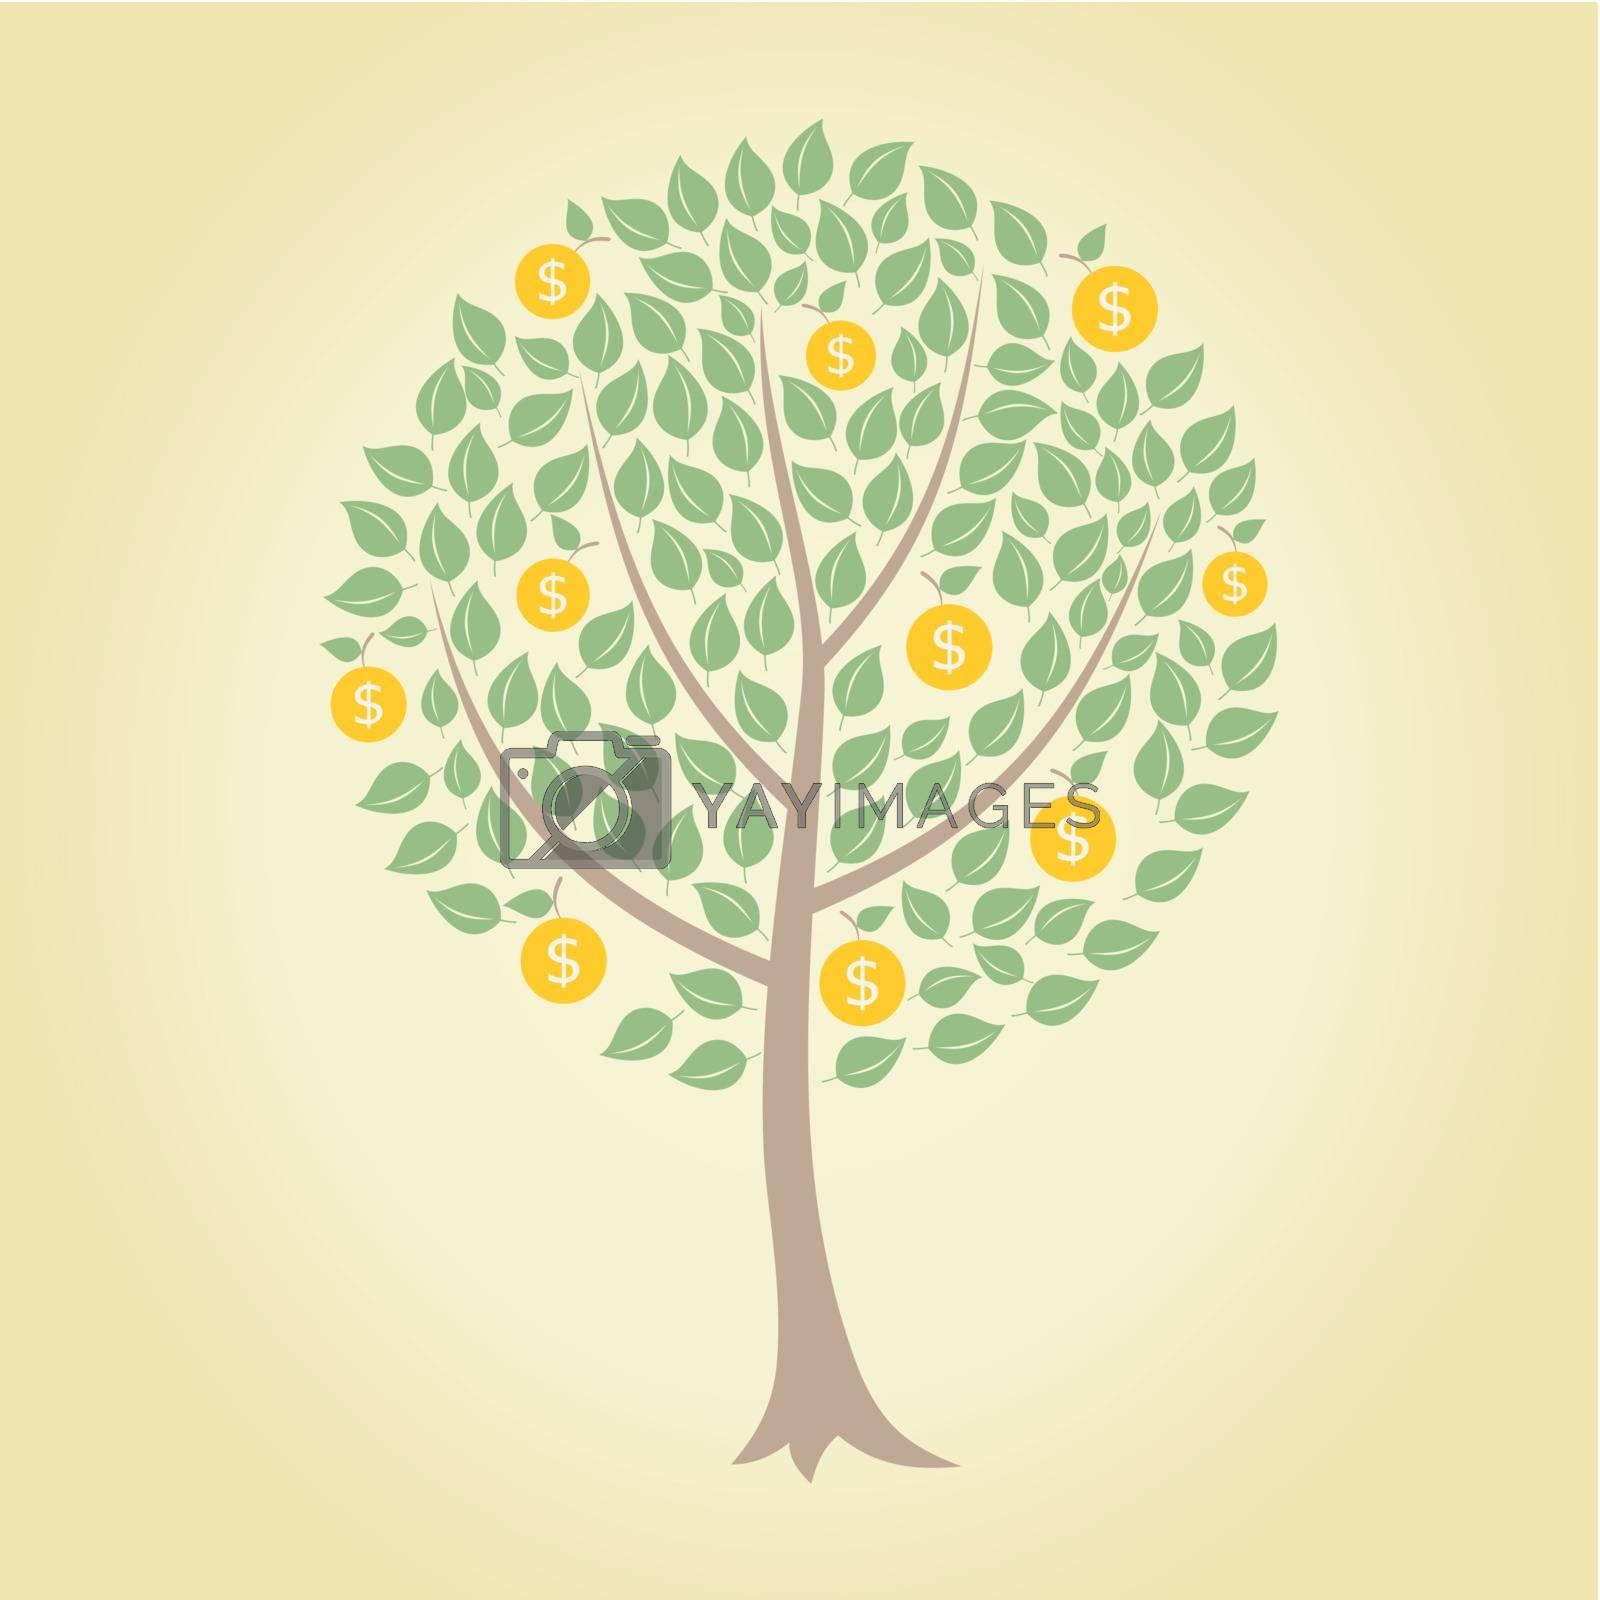 Royalty free image of money tree by aleksander1